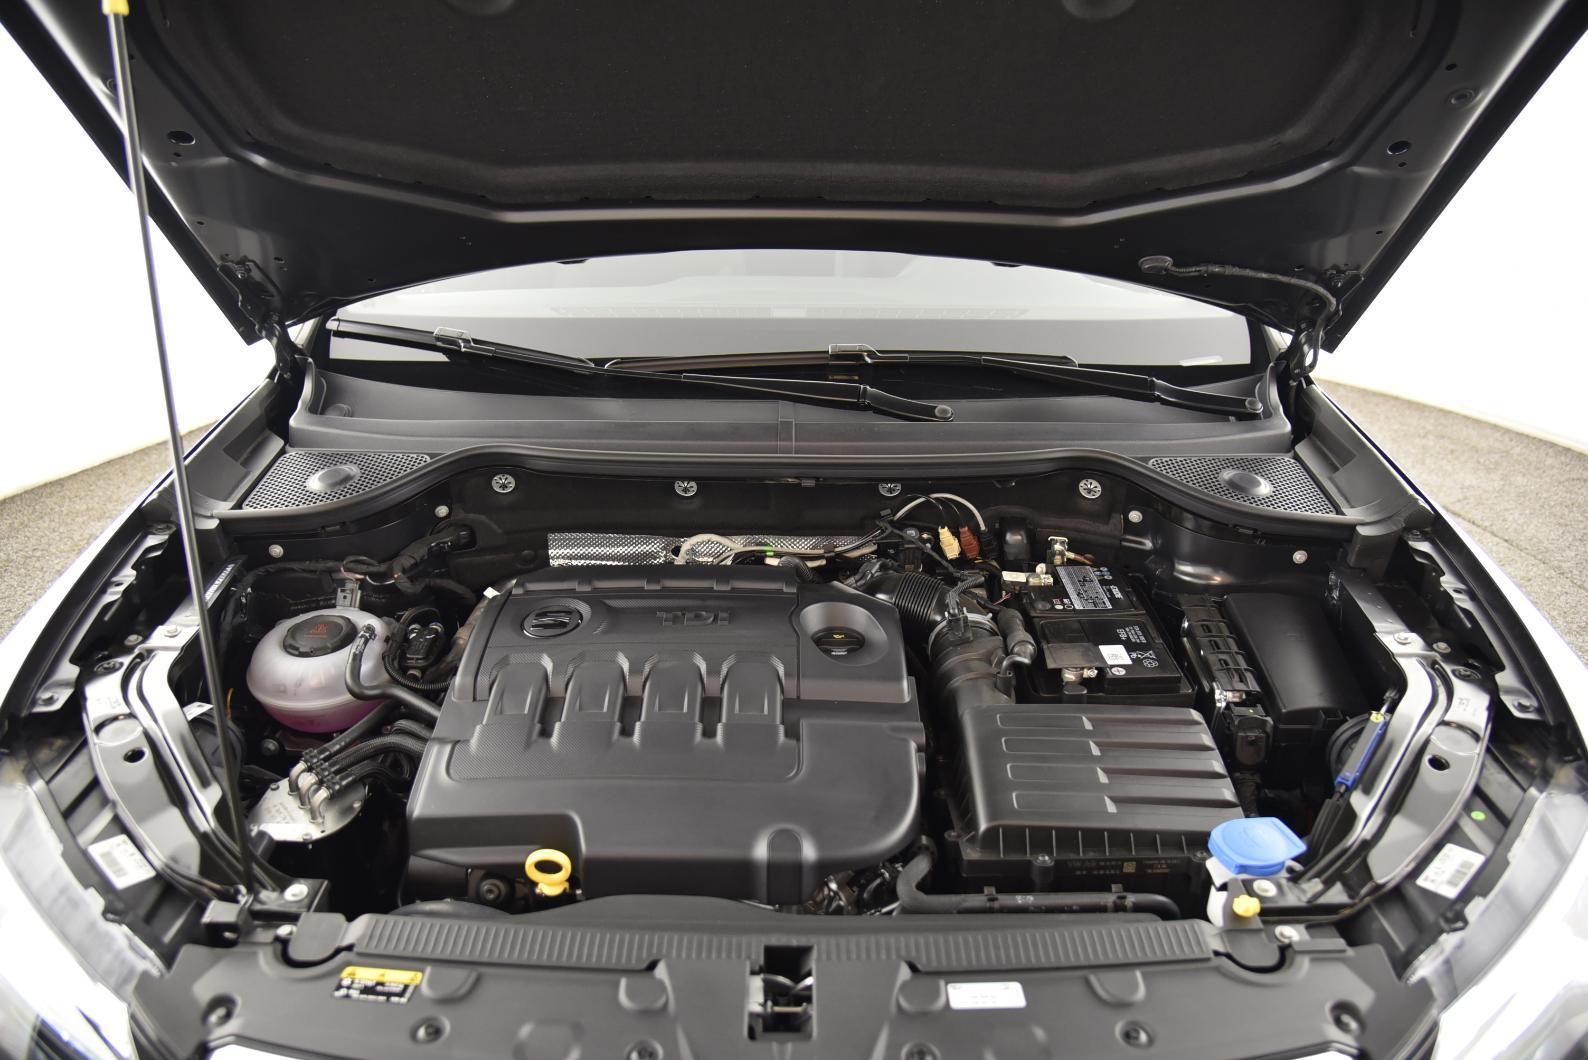 SEAT Ateca 2.0 TDI 150 ch Start/Stop DSG7 FR